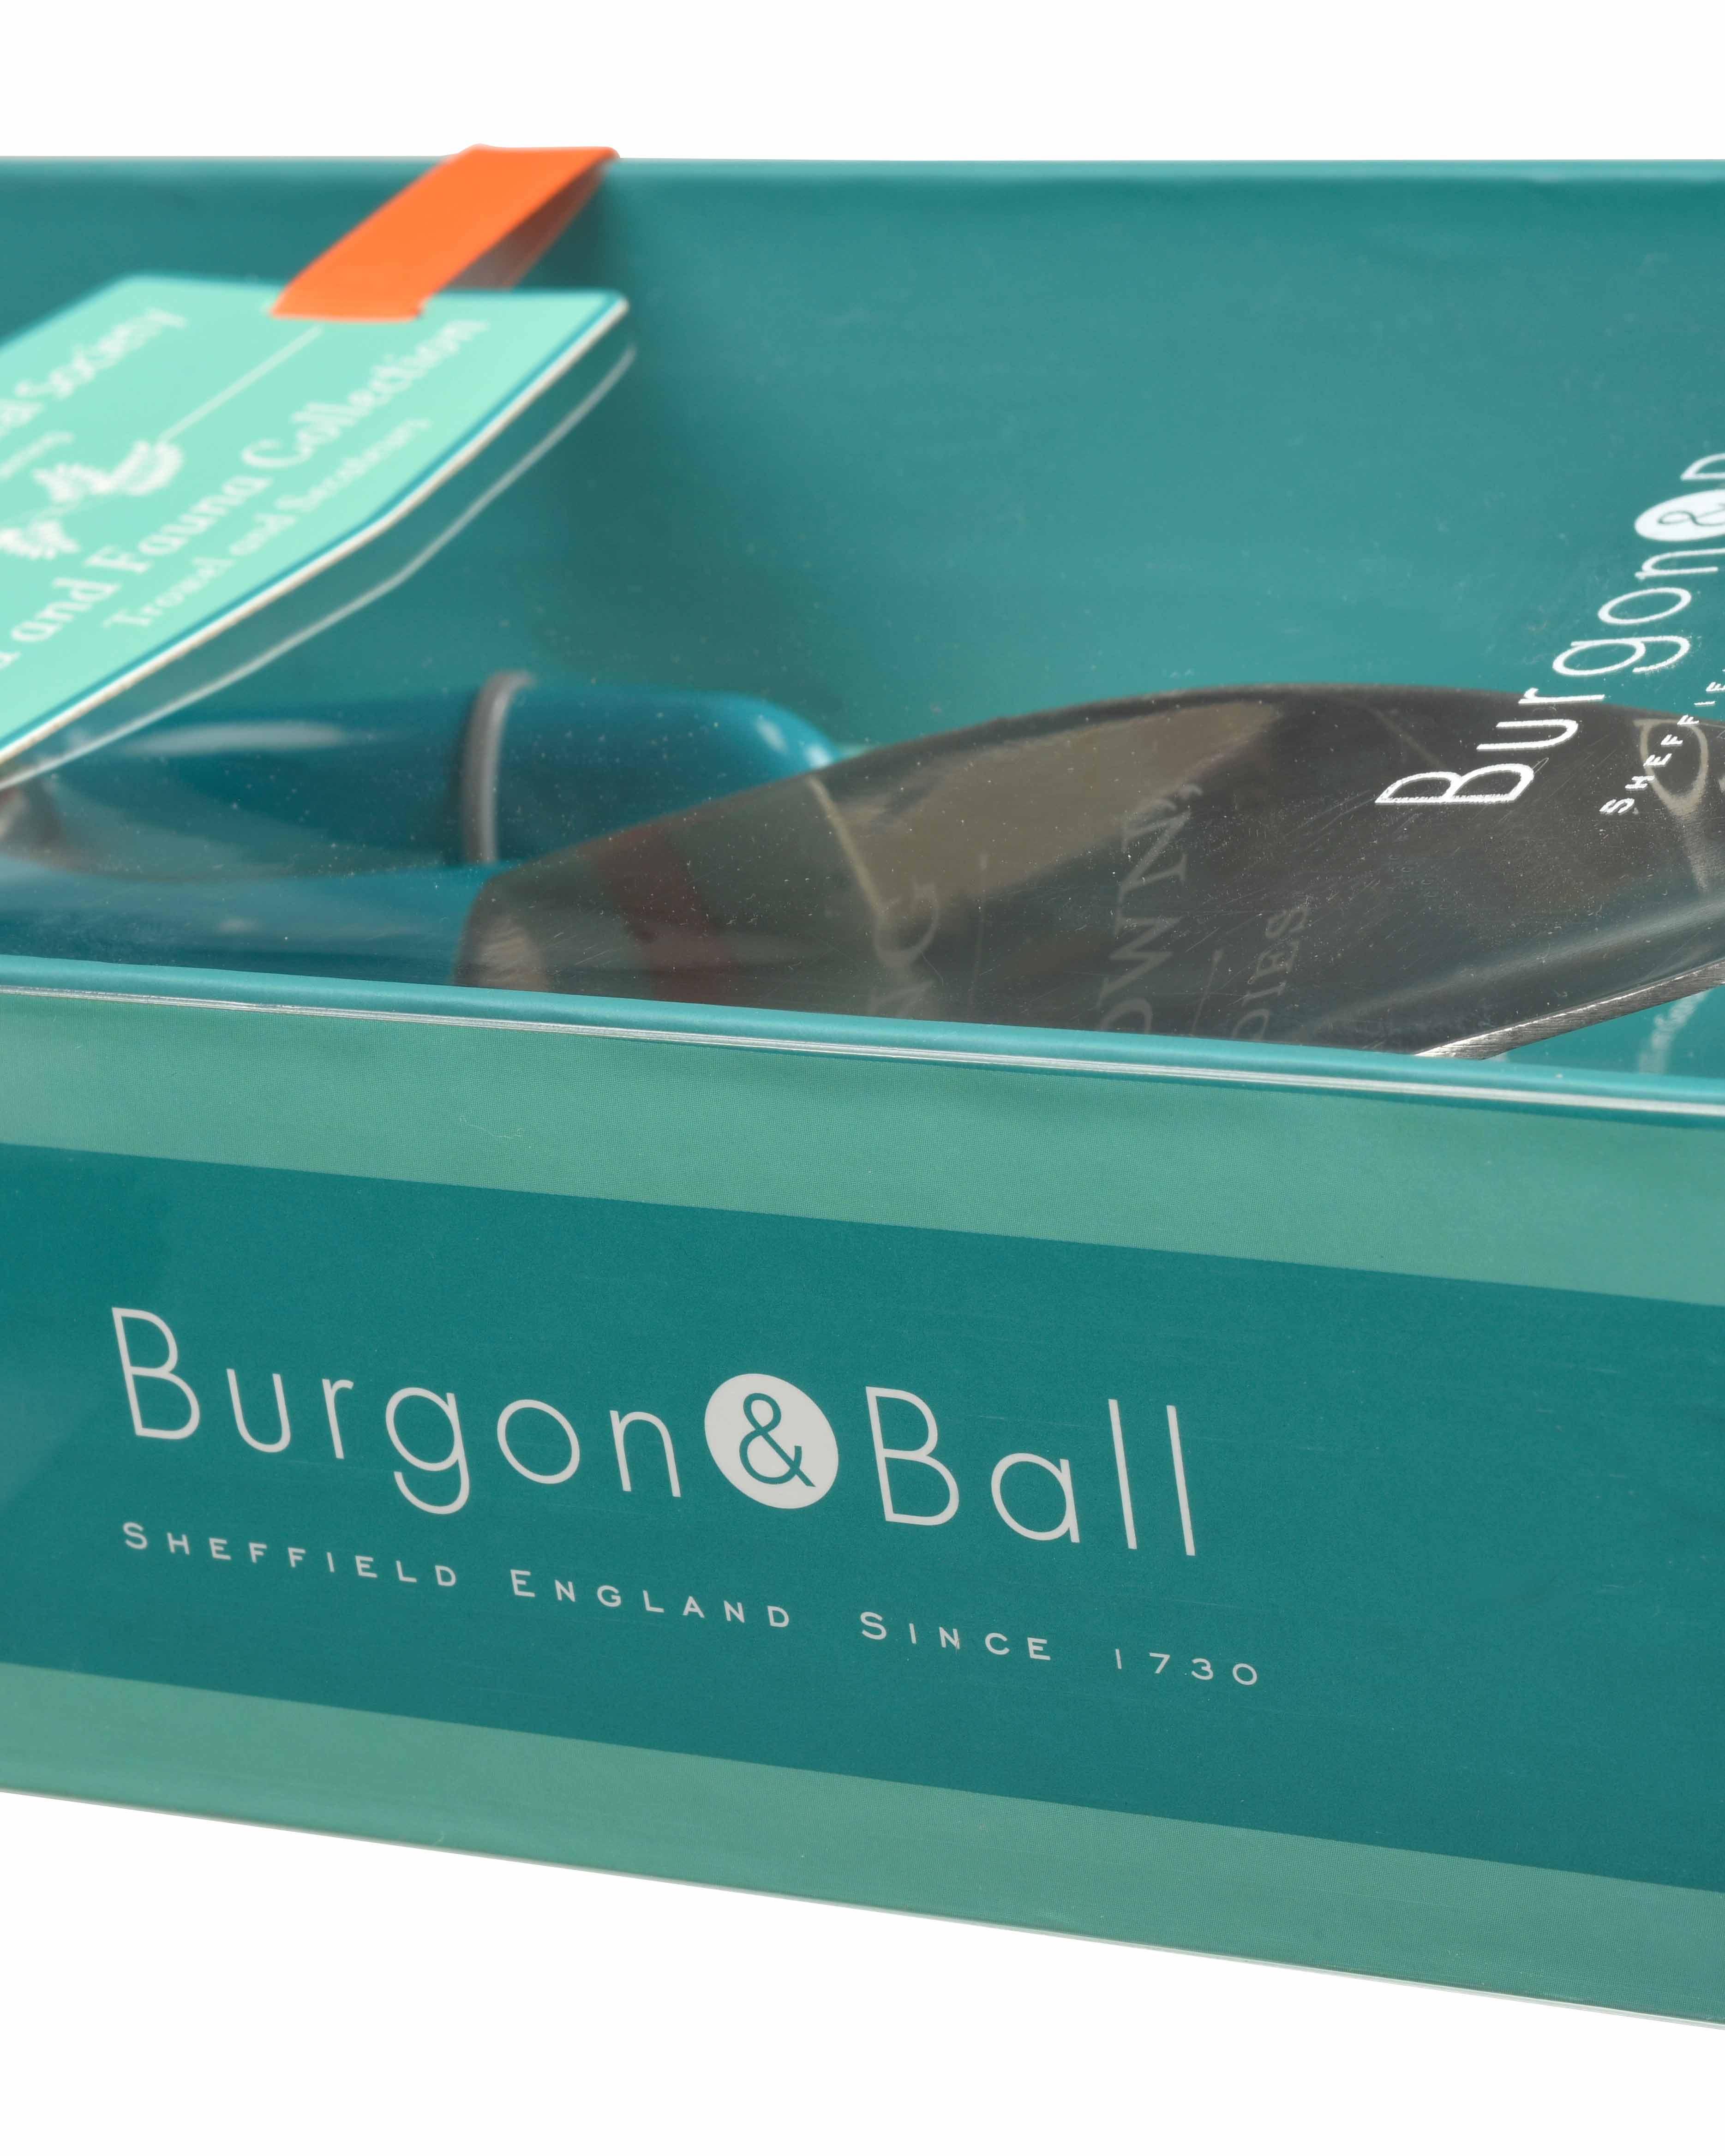 Burgon & Ball Flora & Fauna Boxed Trowel & Secateurs